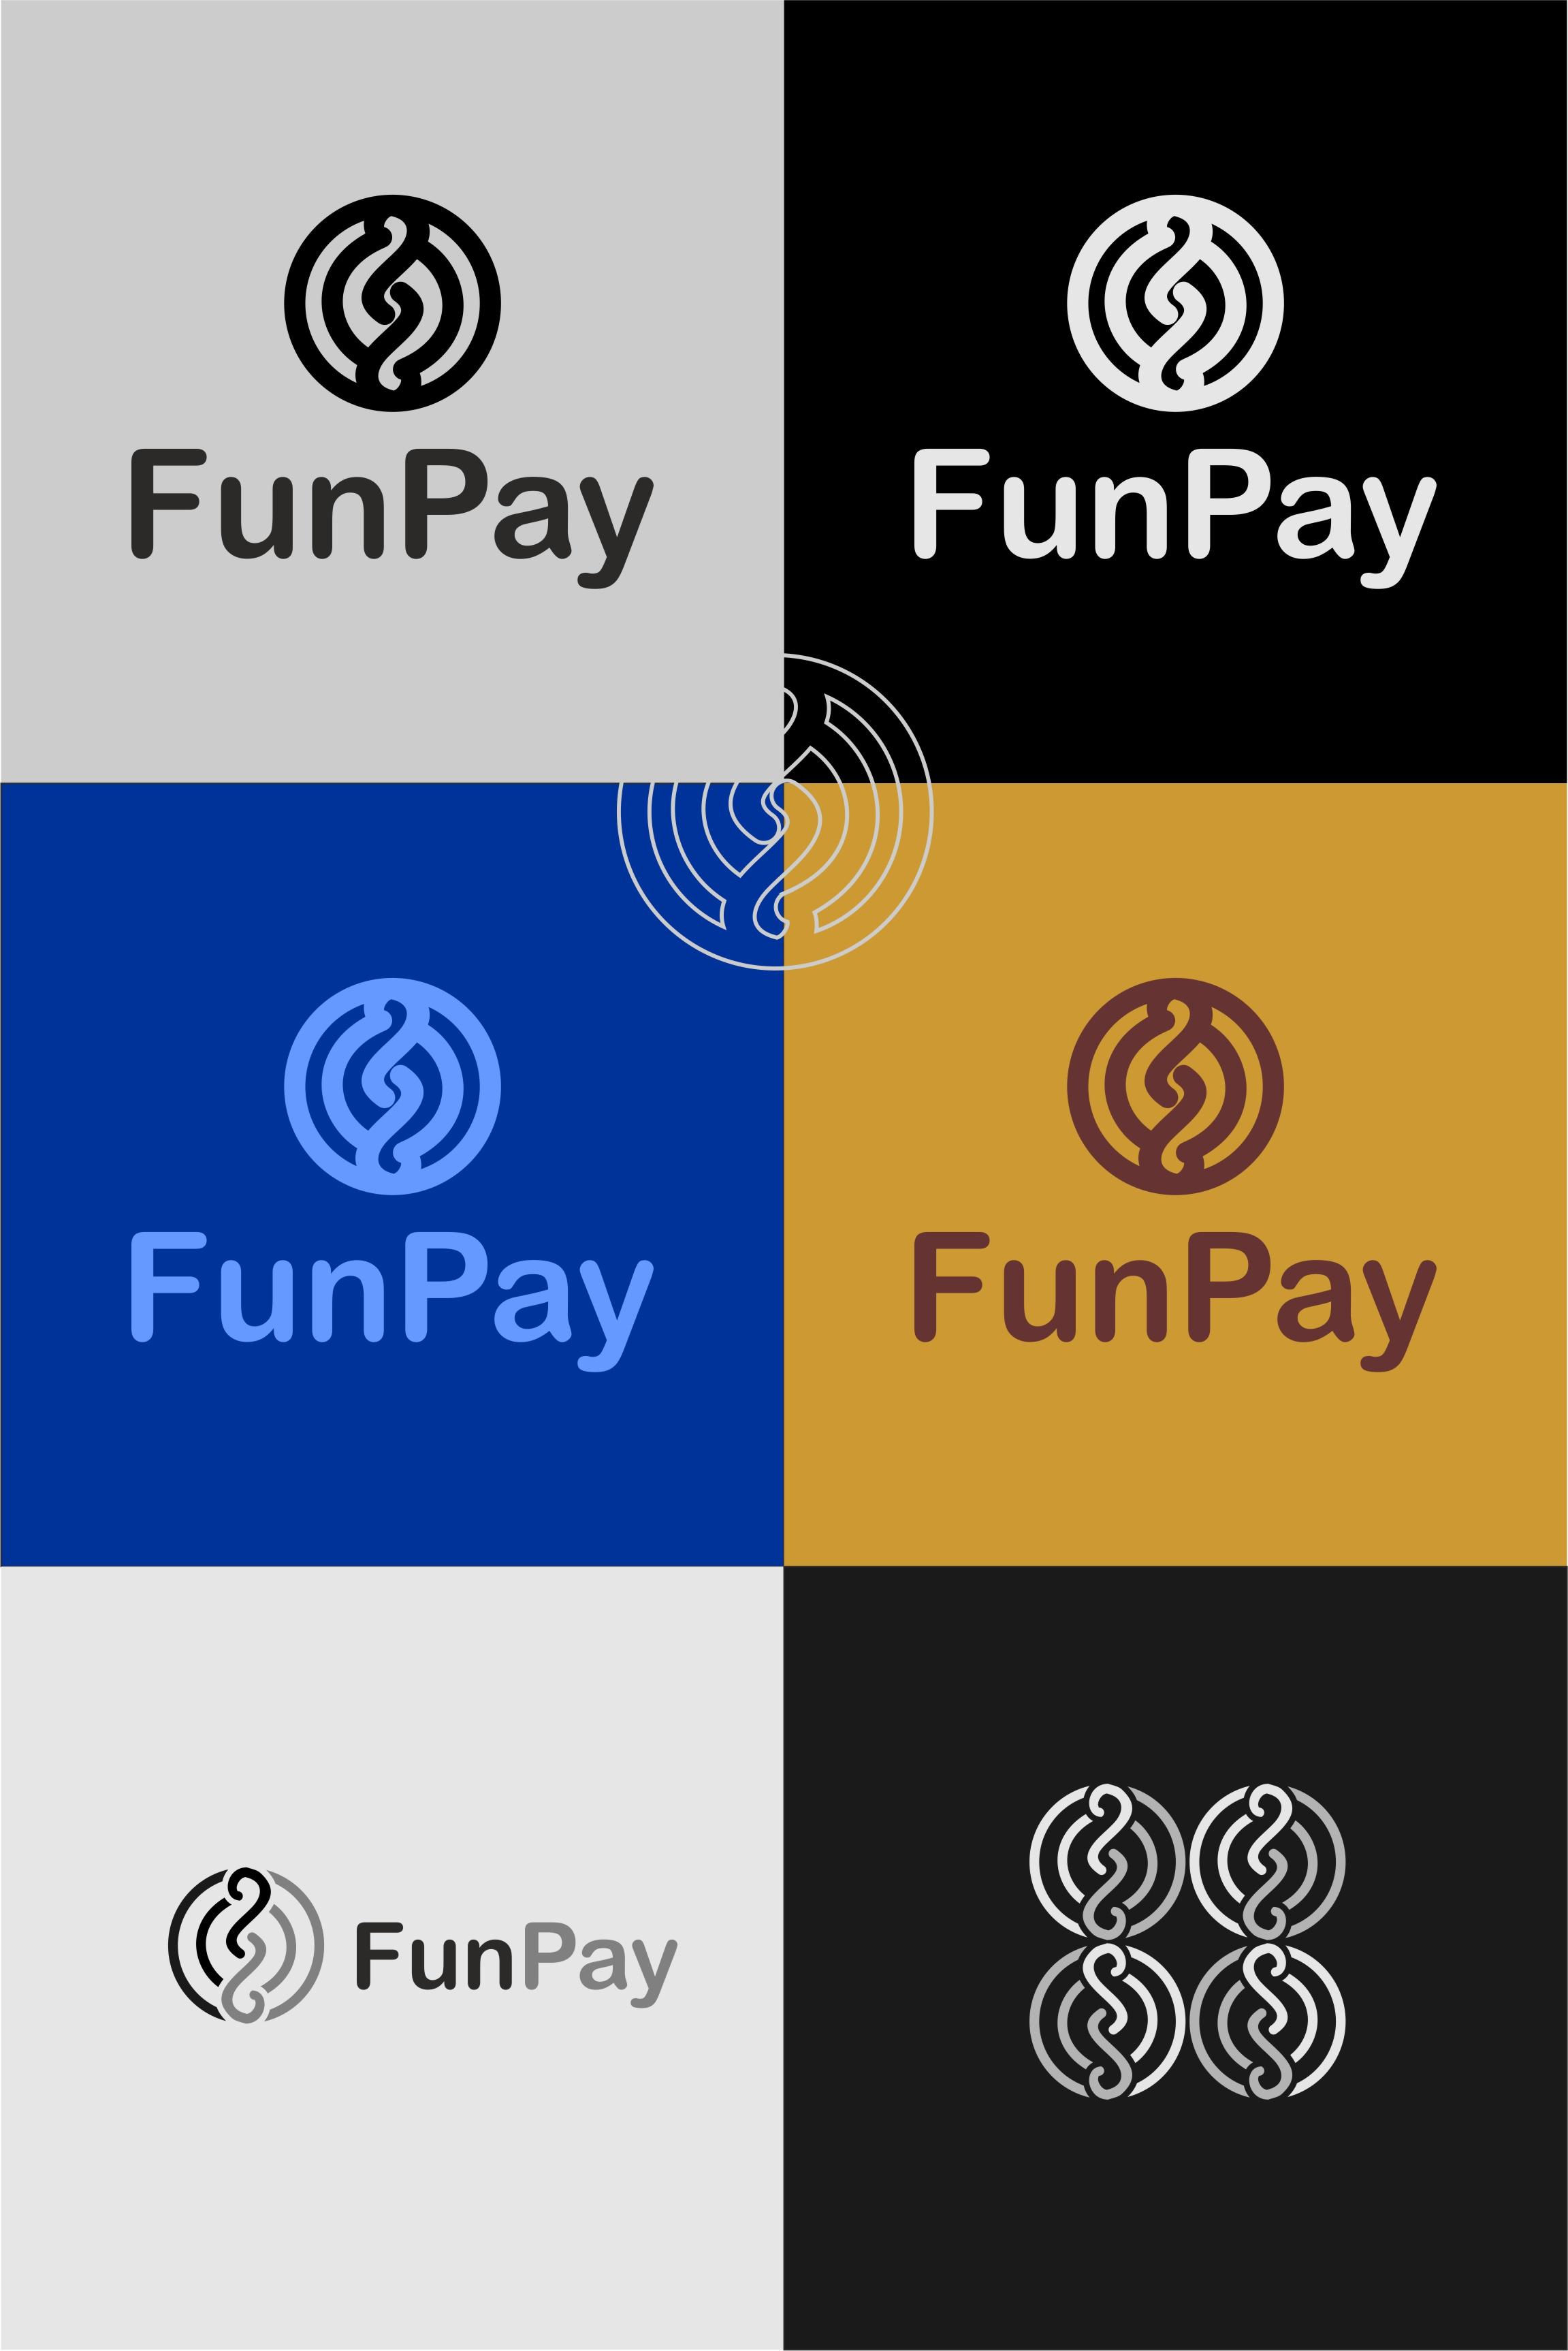 Логотип для FunPay.ru фото f_442599ffe687365b.jpg